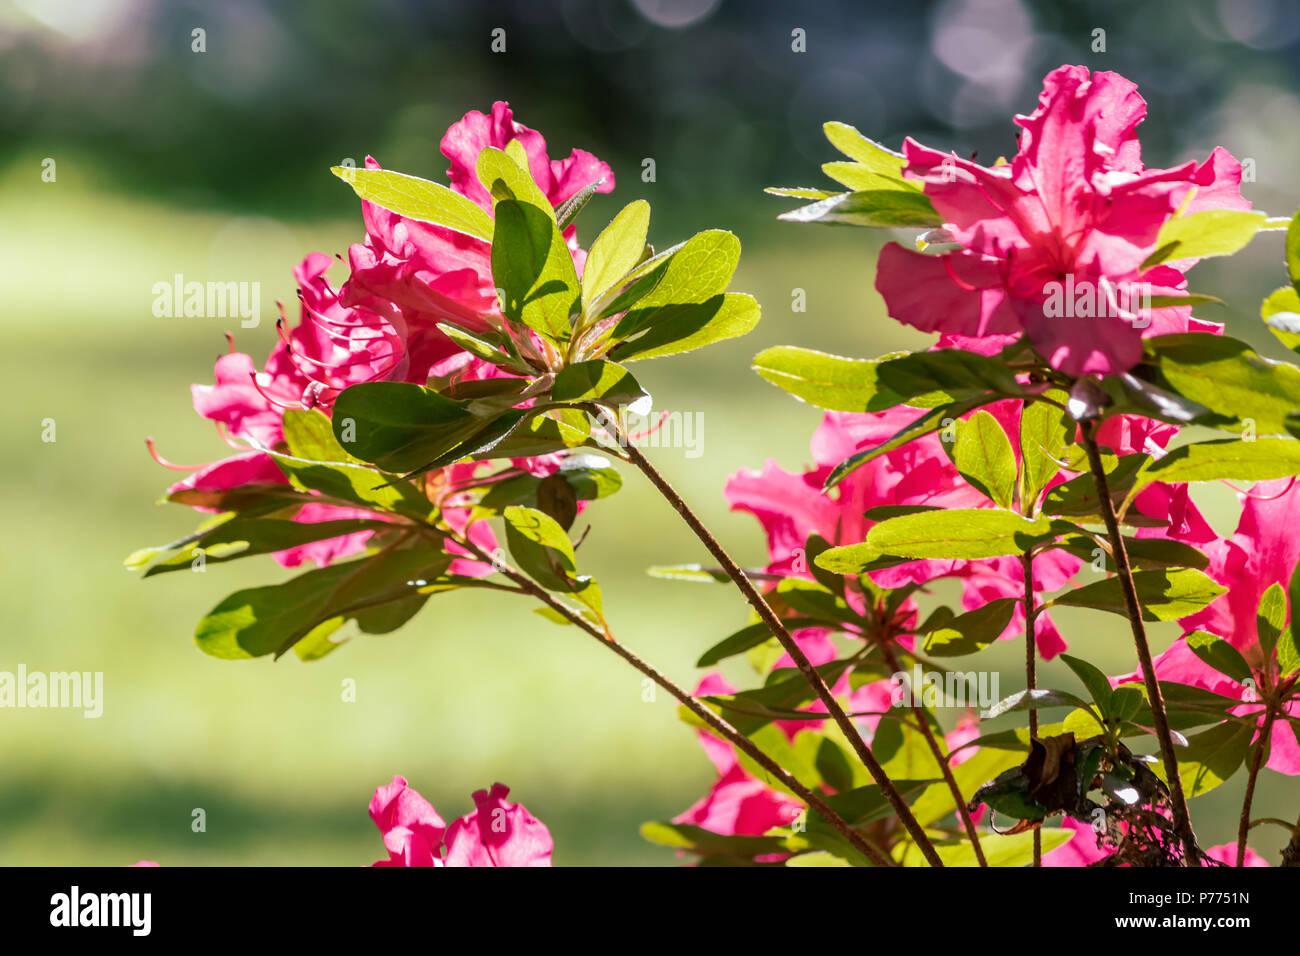 Pink Flowers On A Bush Stock Photo 210984641 Alamy